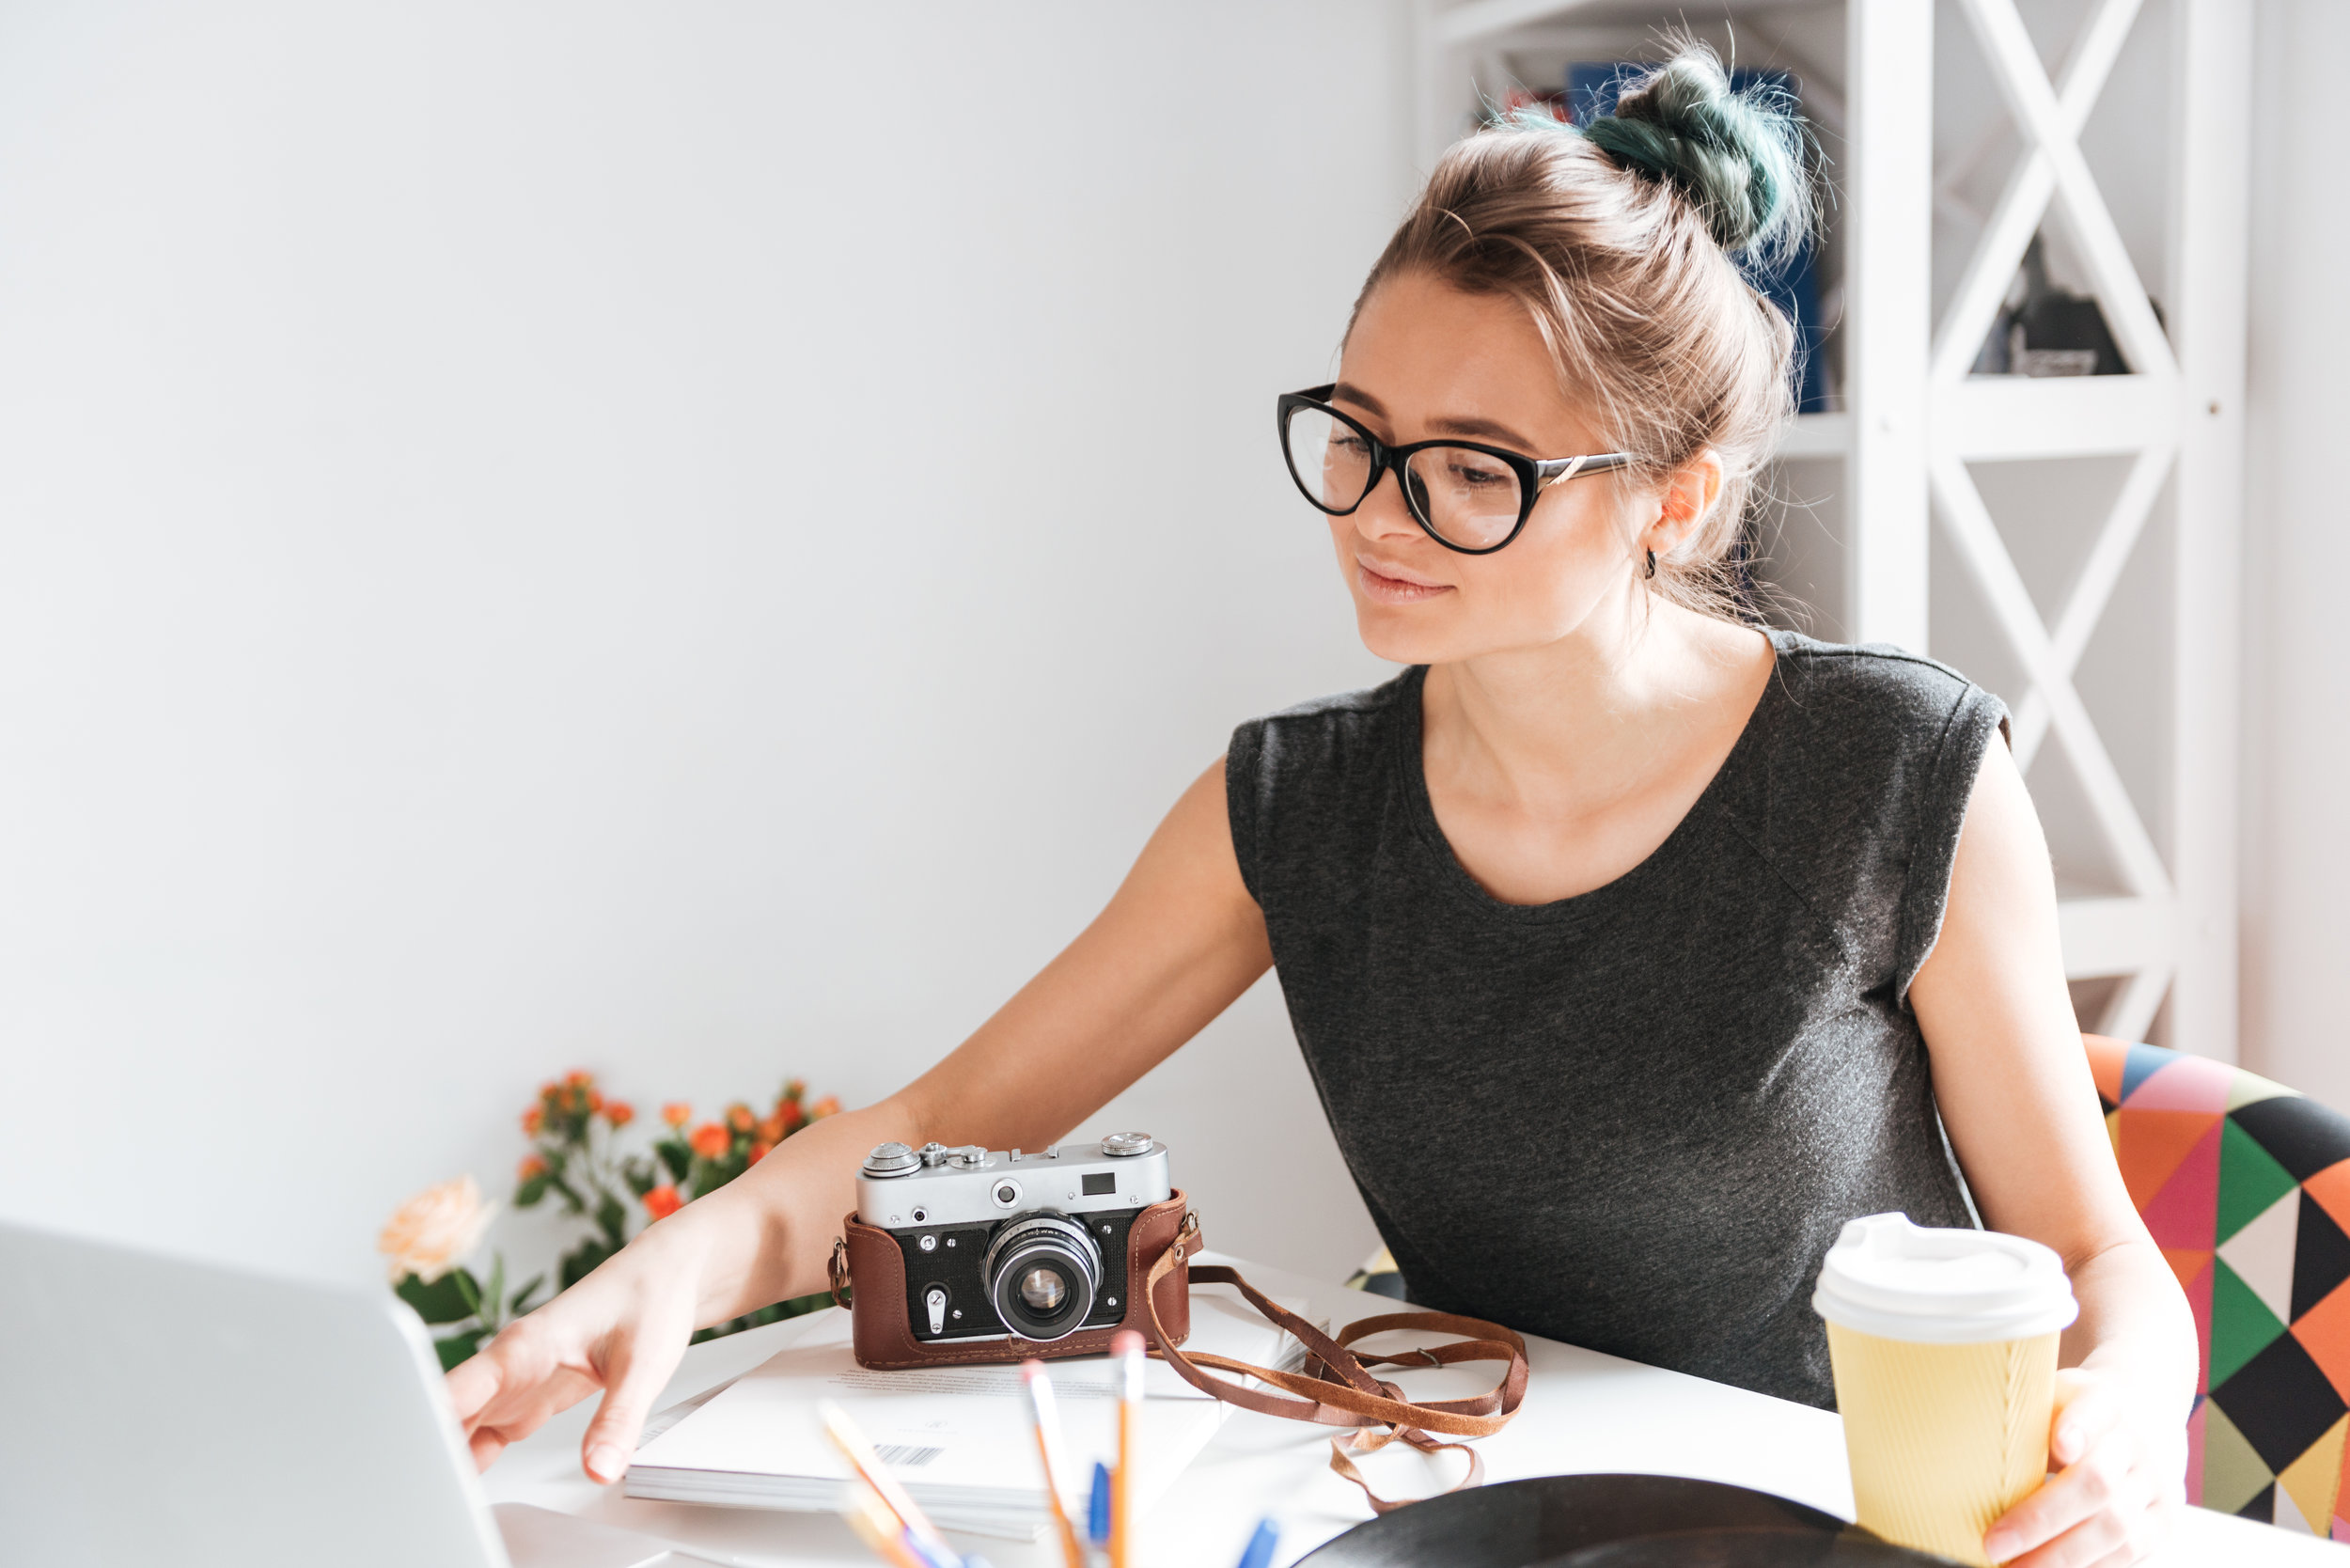 4 Tips To Land Your Dream Internship